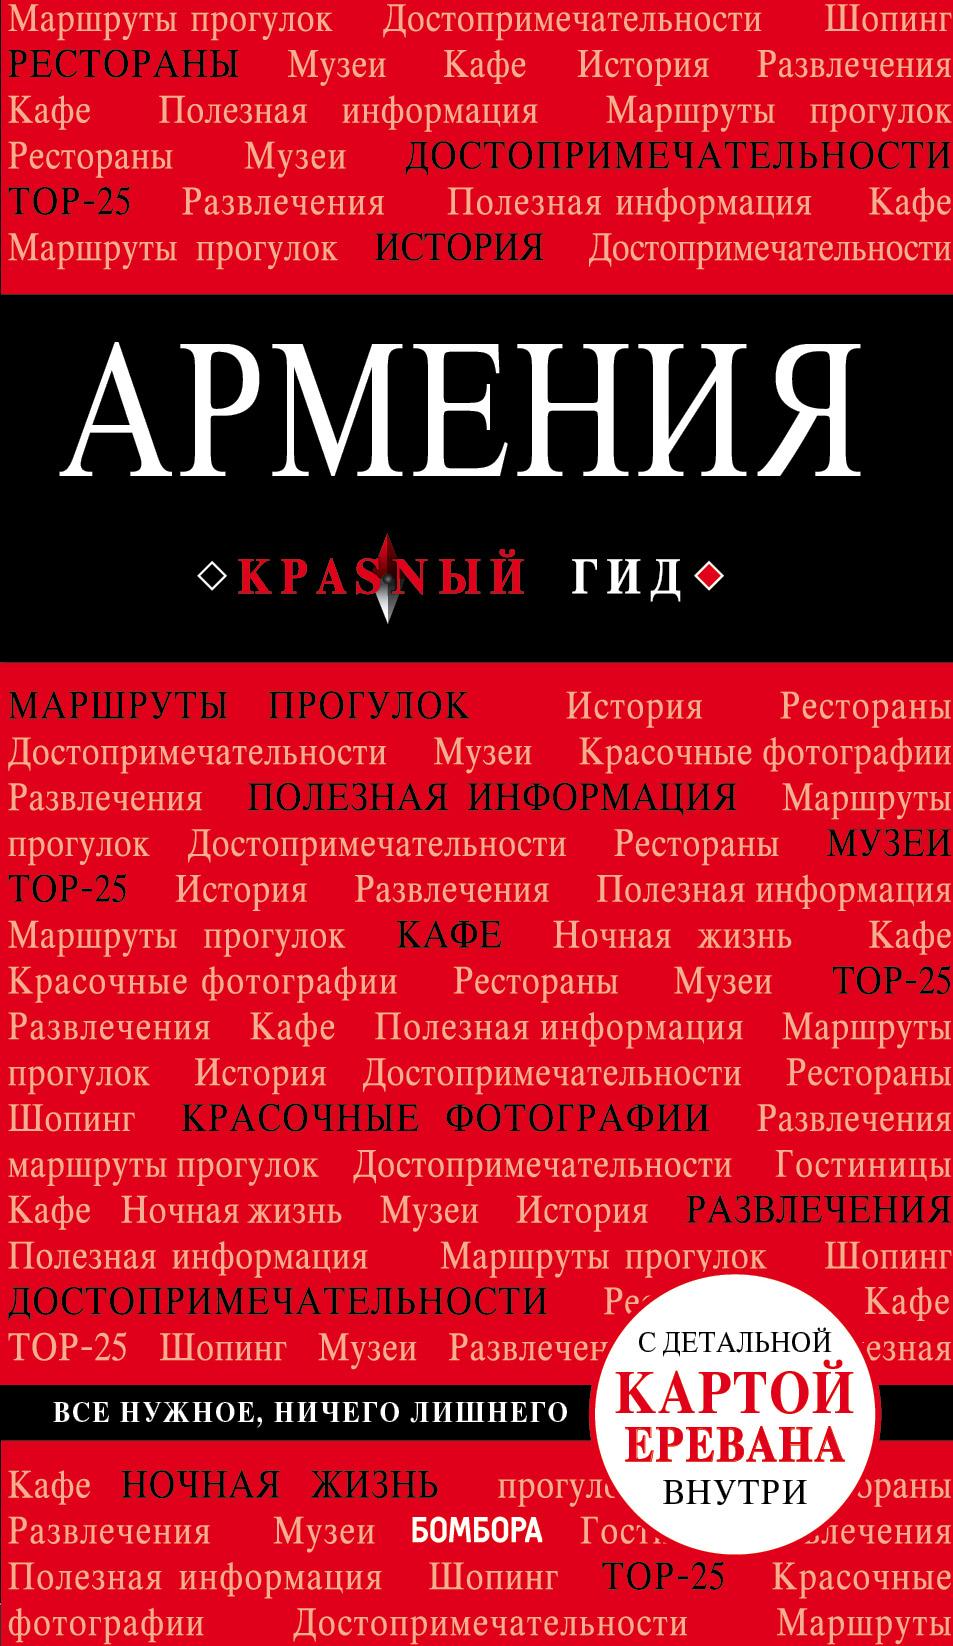 Дмитрий Кульков Армения. Путеводитель дмитрий кульков екатеринбург isbn 978 5 699 86596 3